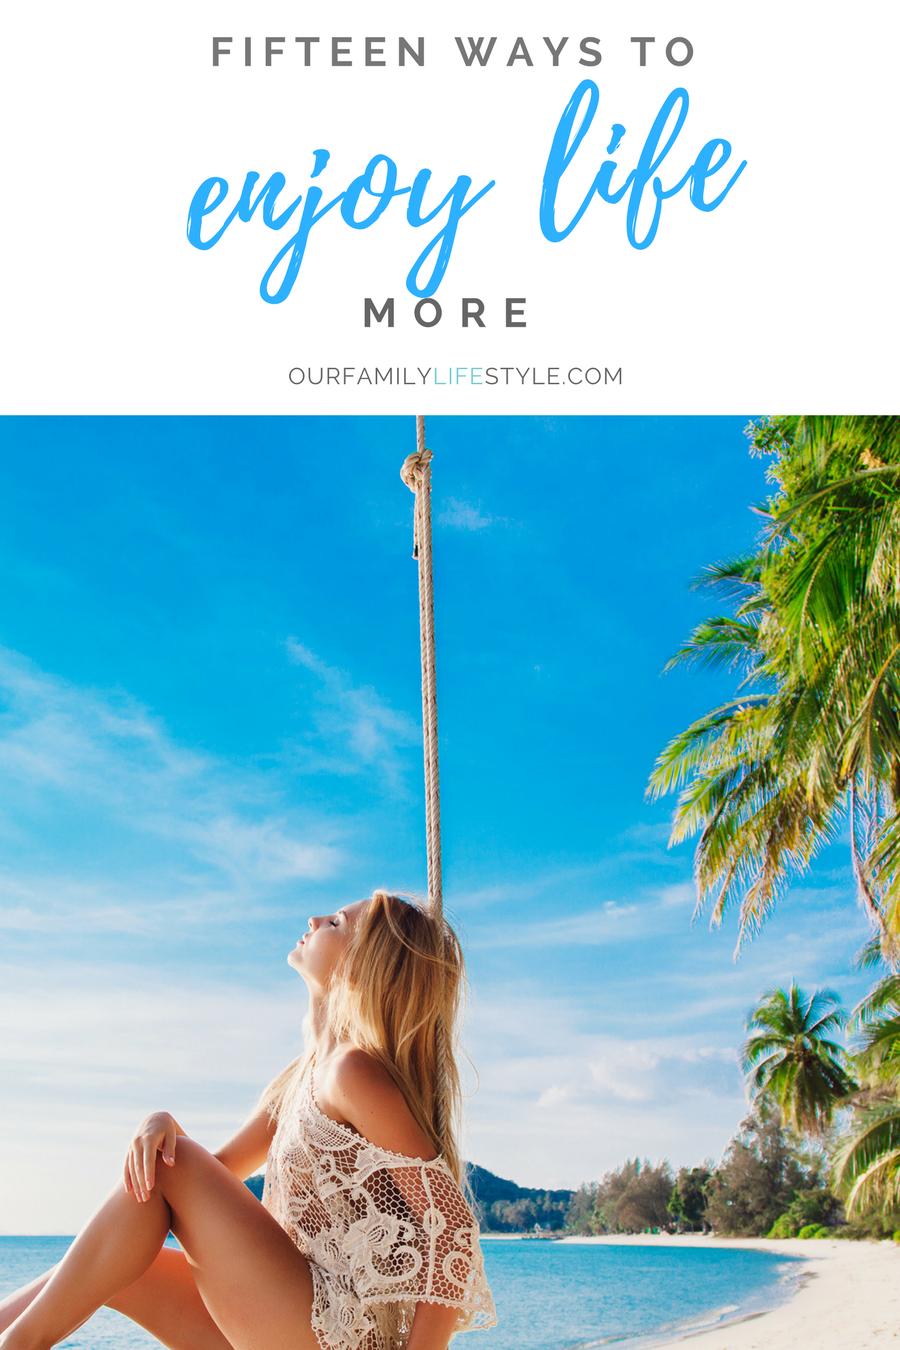 15 ways to enjoy life more